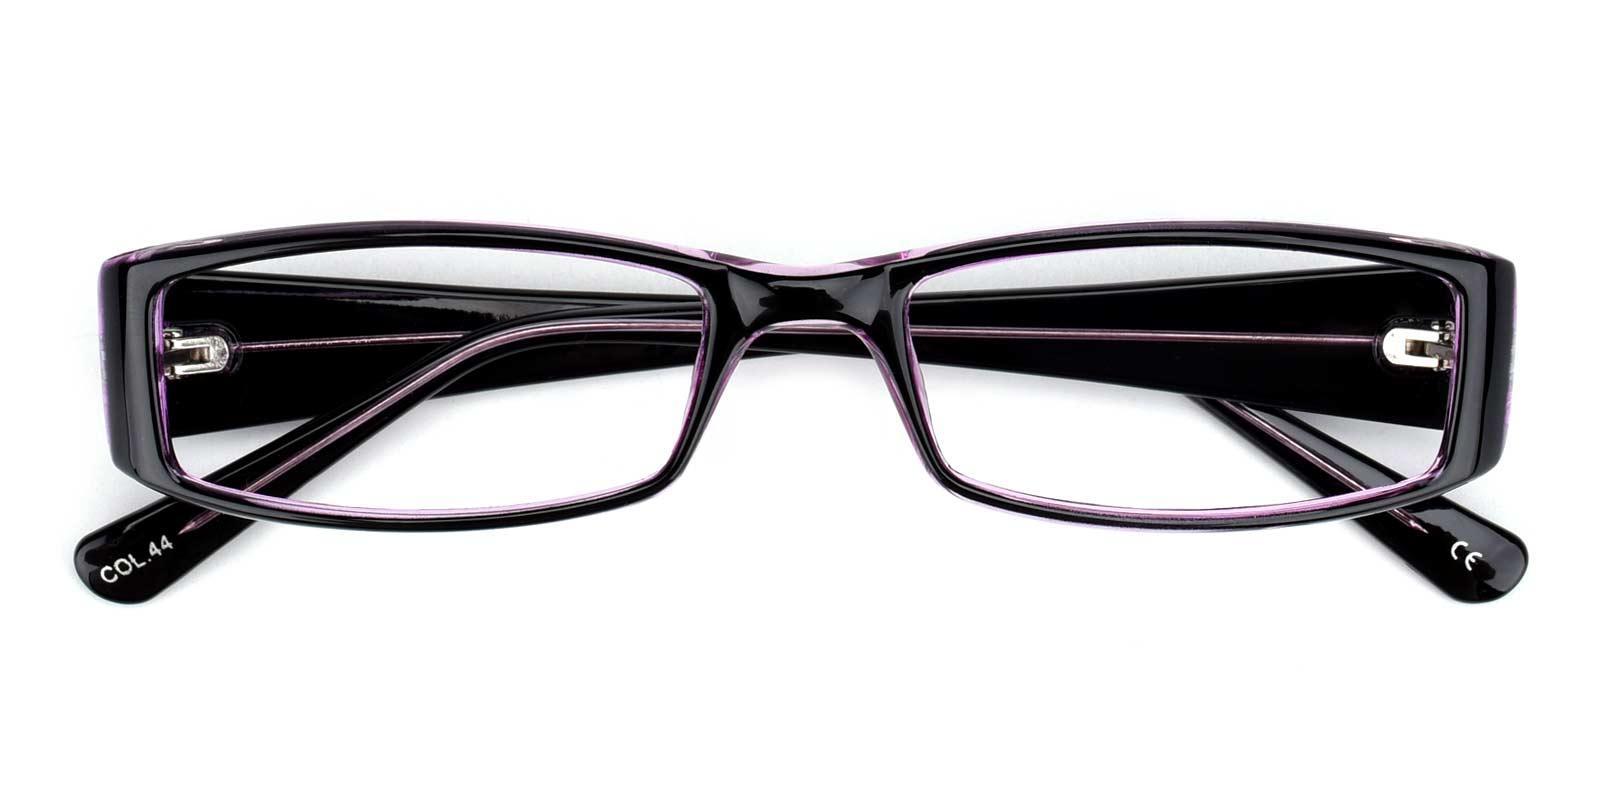 Drums-Purple-Rectangle-Plastic-Eyeglasses-detail